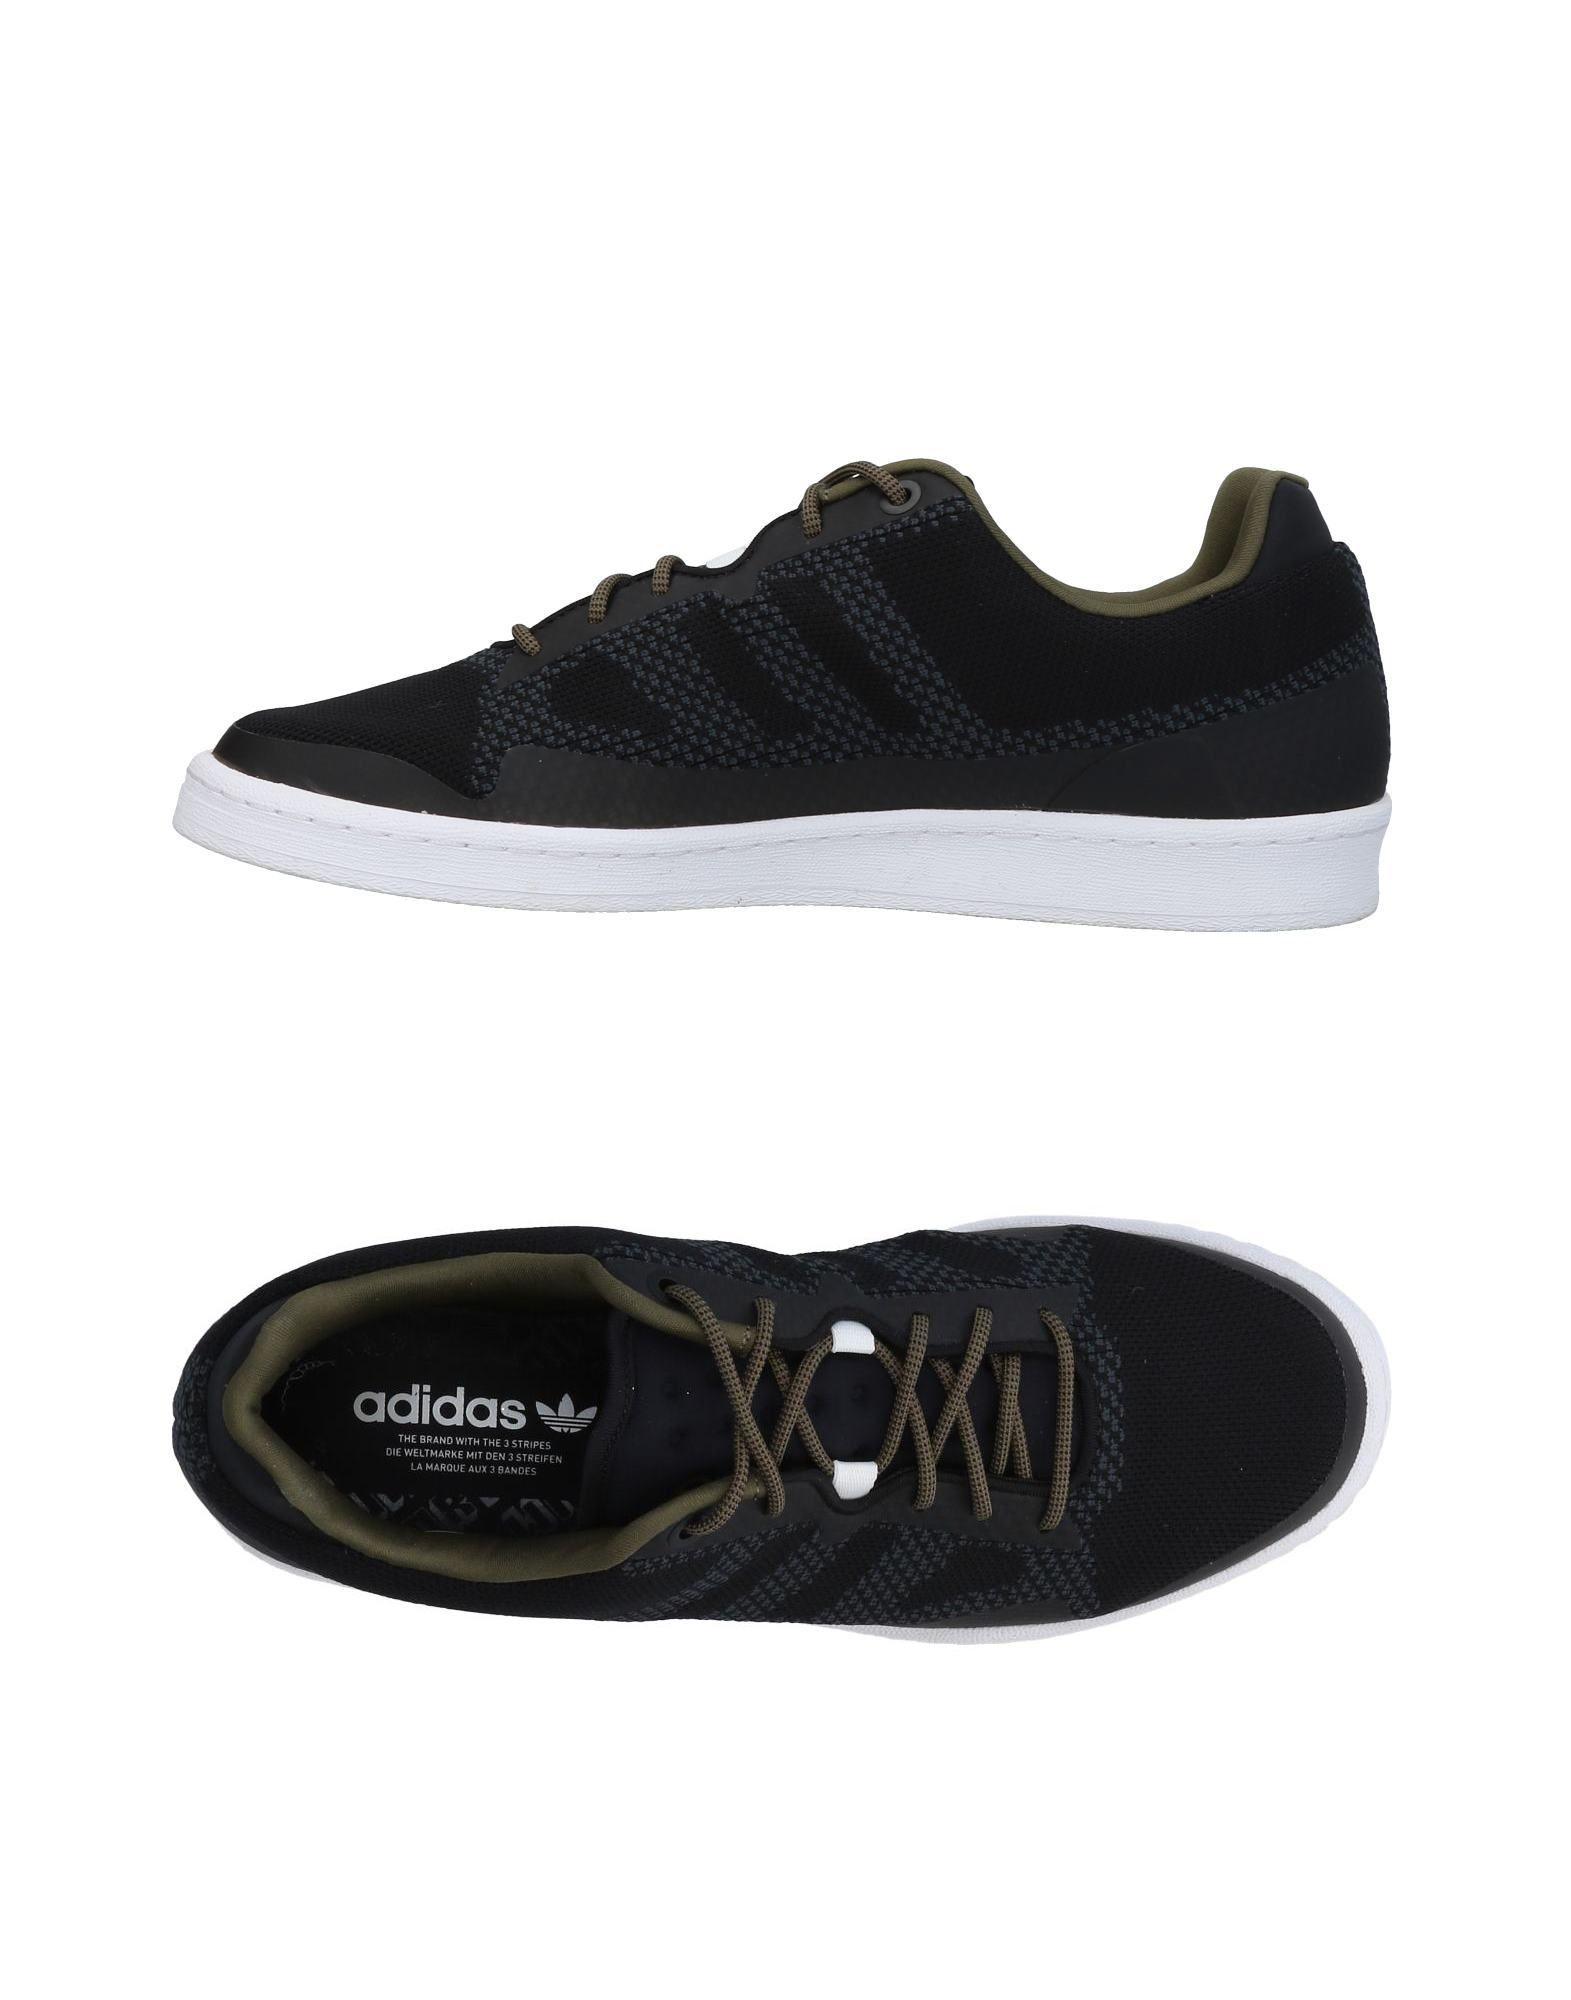 Moda Sneakers Adidas Uomo - 11452666BN